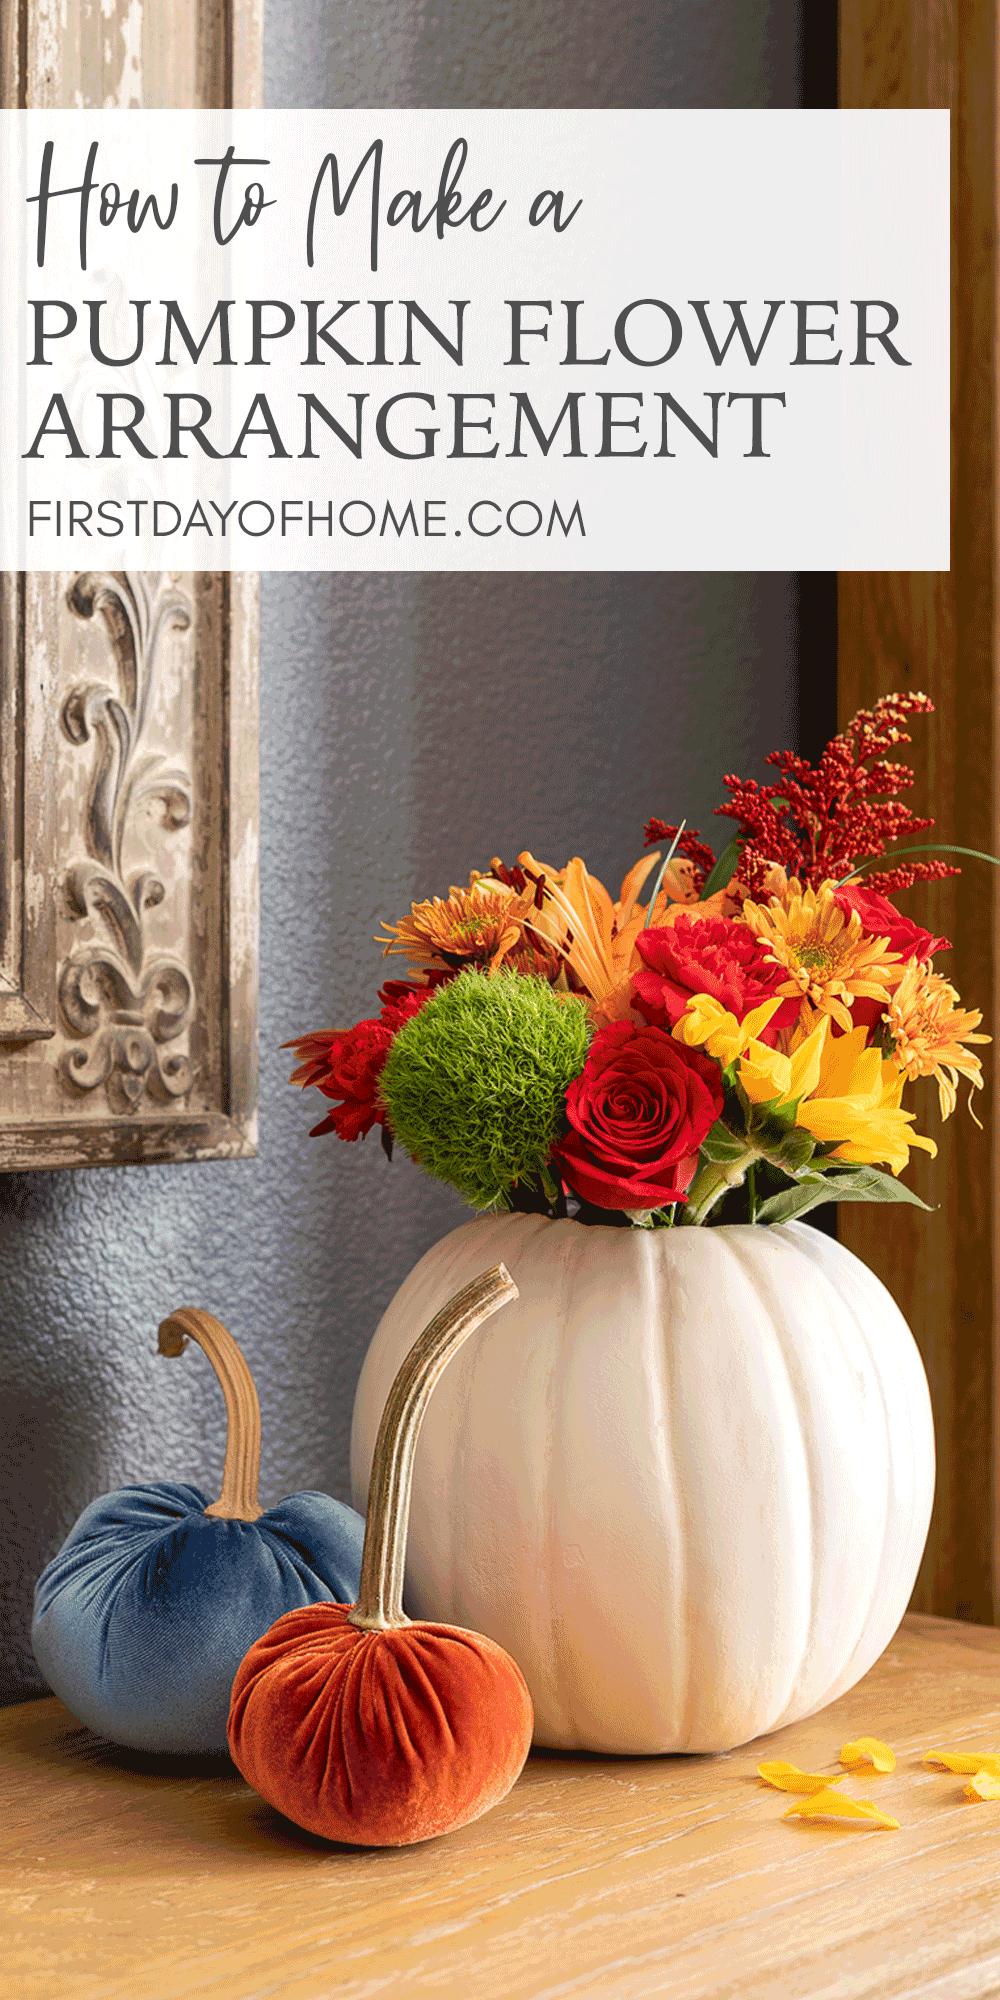 "Pinterest pin reading ""How to Make a Pumpkin Flower Arrangement"" with photo of pumpkin vase filled with flowers next to velvet pumpkins"